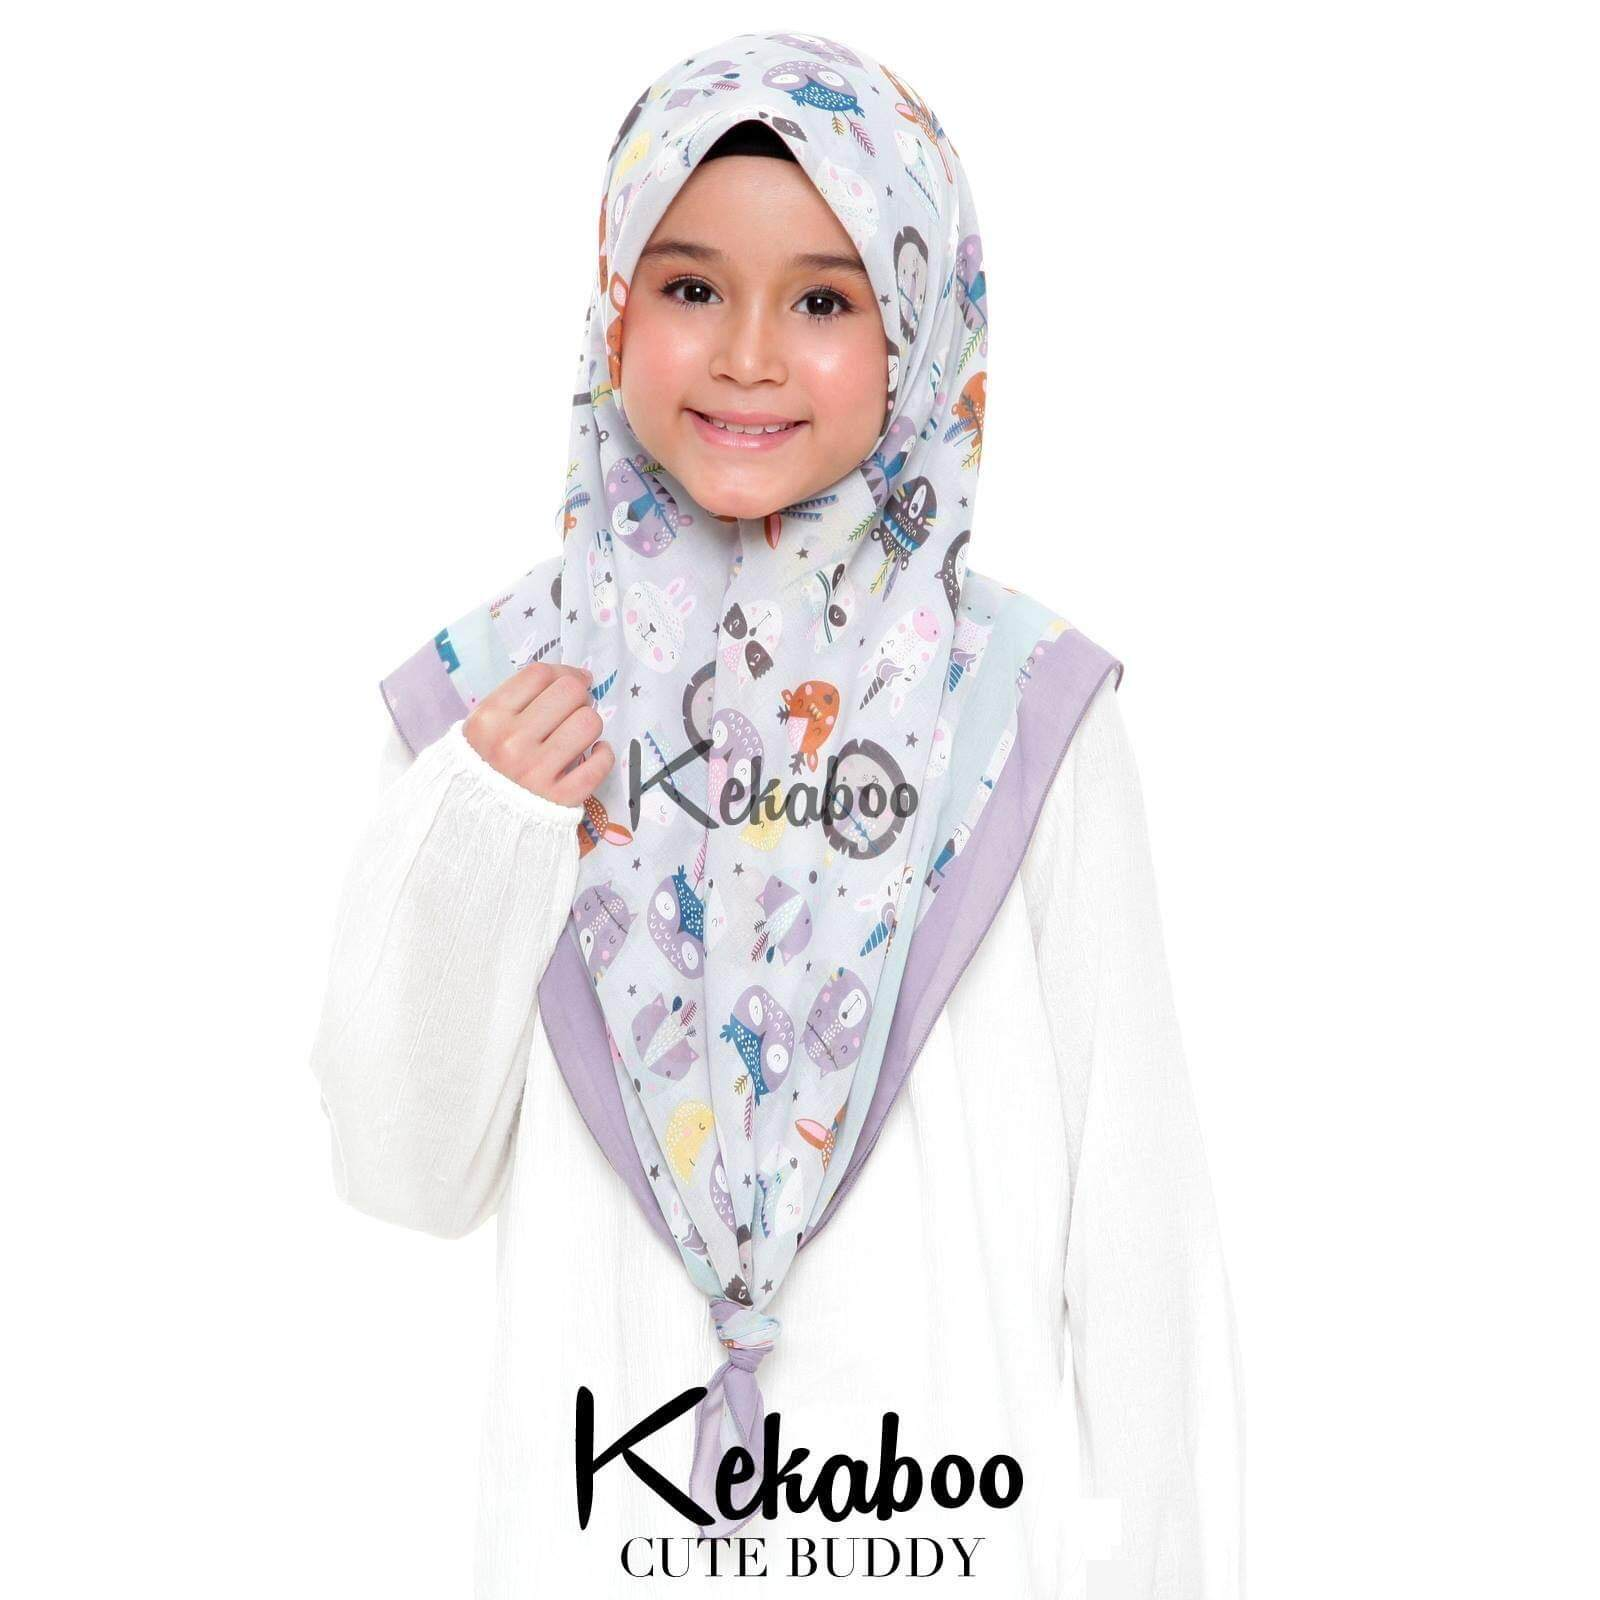 Kekaboo Kids Cute Buddy By Kekaboo & Mirabelle Exclusive.